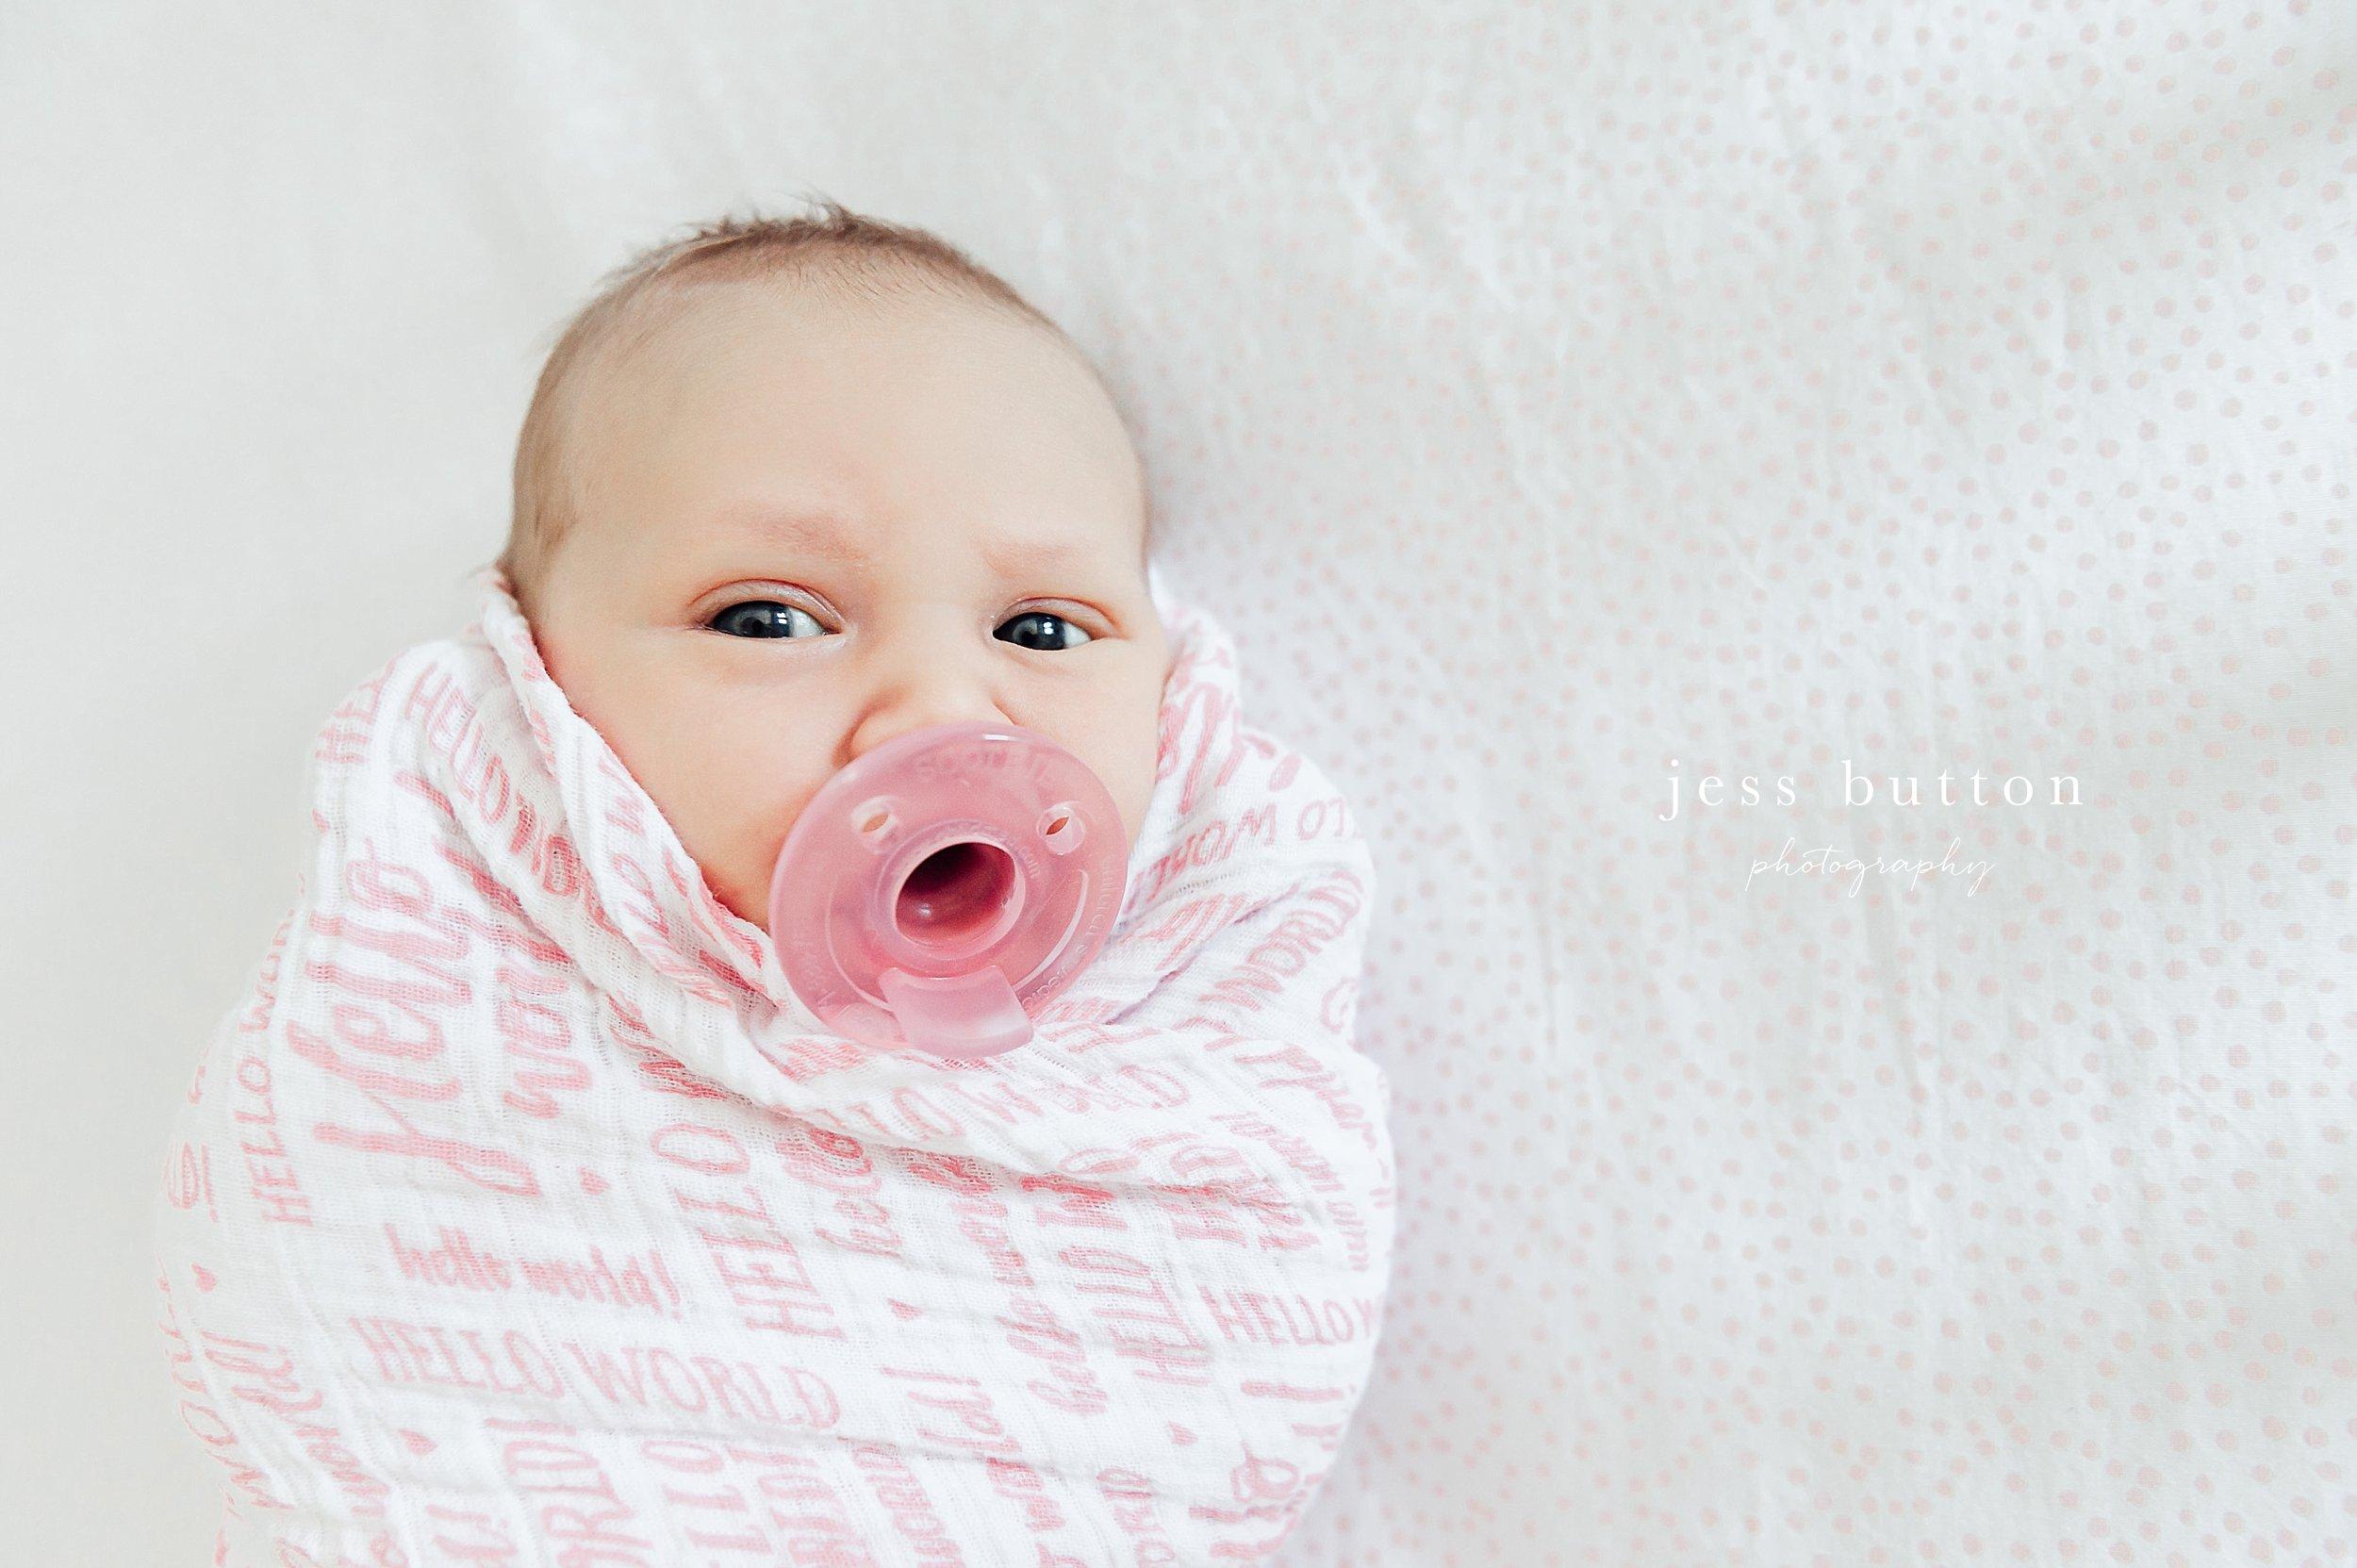 niagara newborn photographer - St Catharines baby photos - 8 day old girl swaddled awake in crib